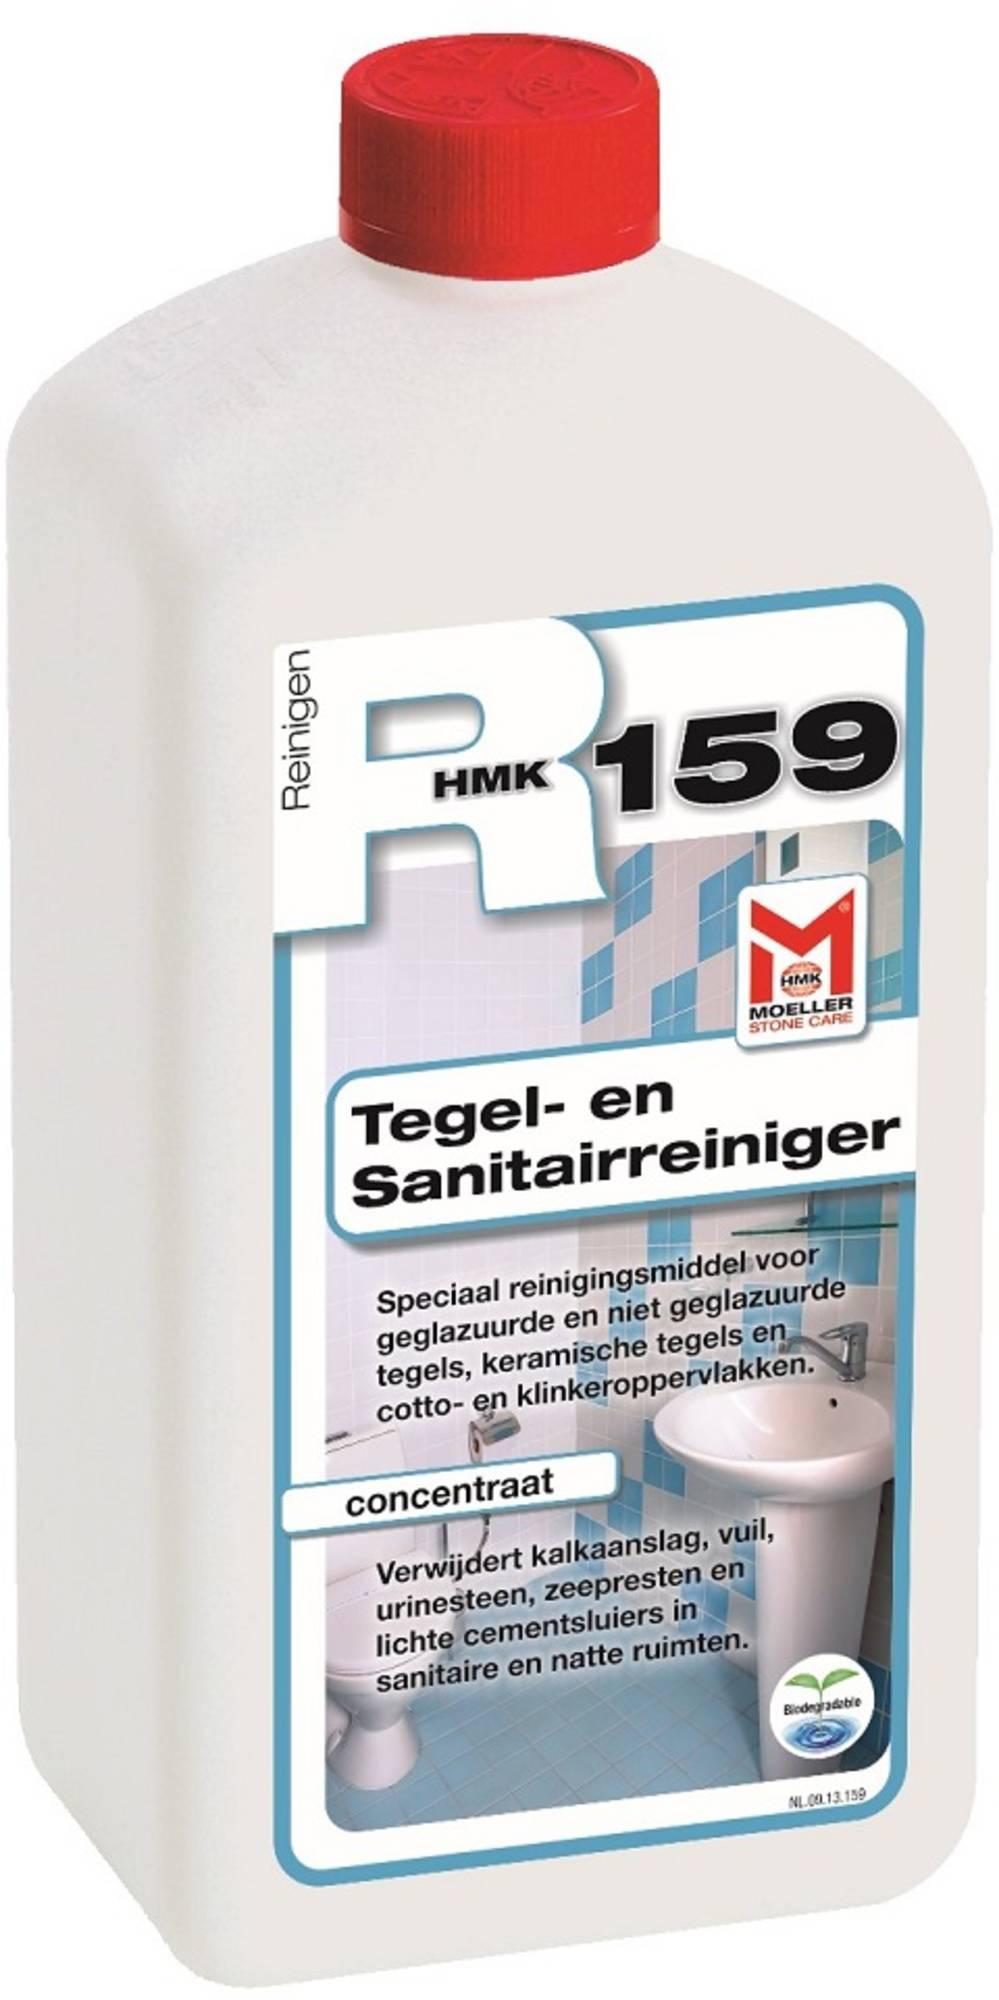 HMK R159 Tegel- en sanitairreiniger